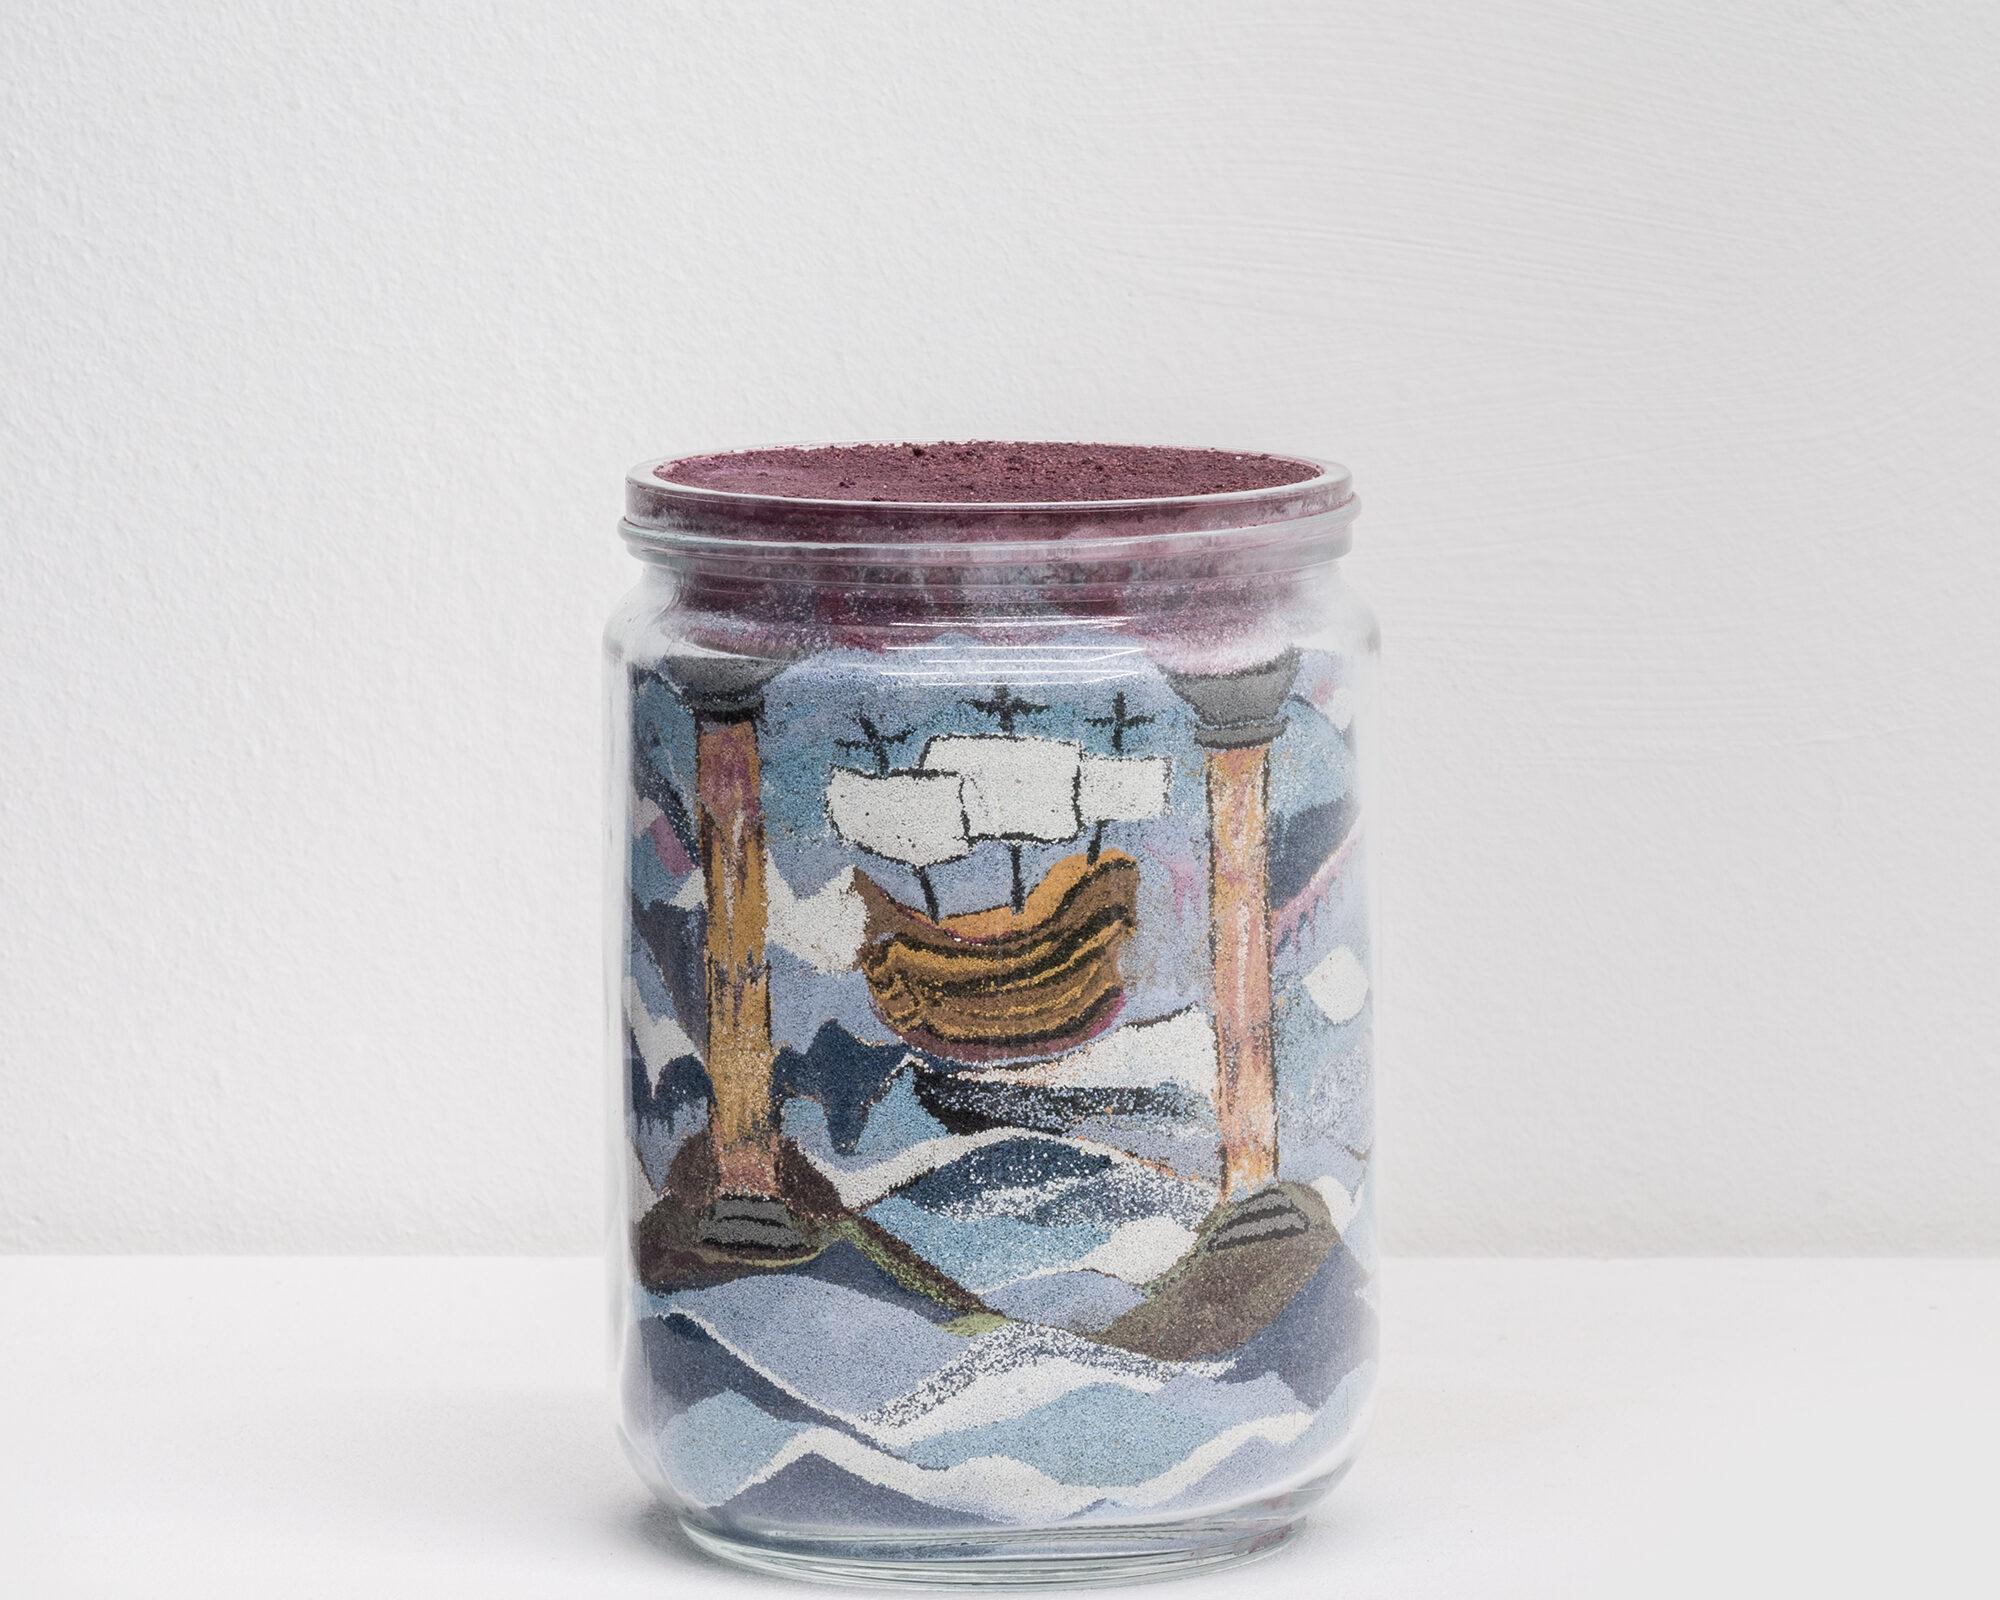 8. marco gobbi - A dive where the wather is more blue - sabbia, pigmento, vetro h16diam12cm 2017